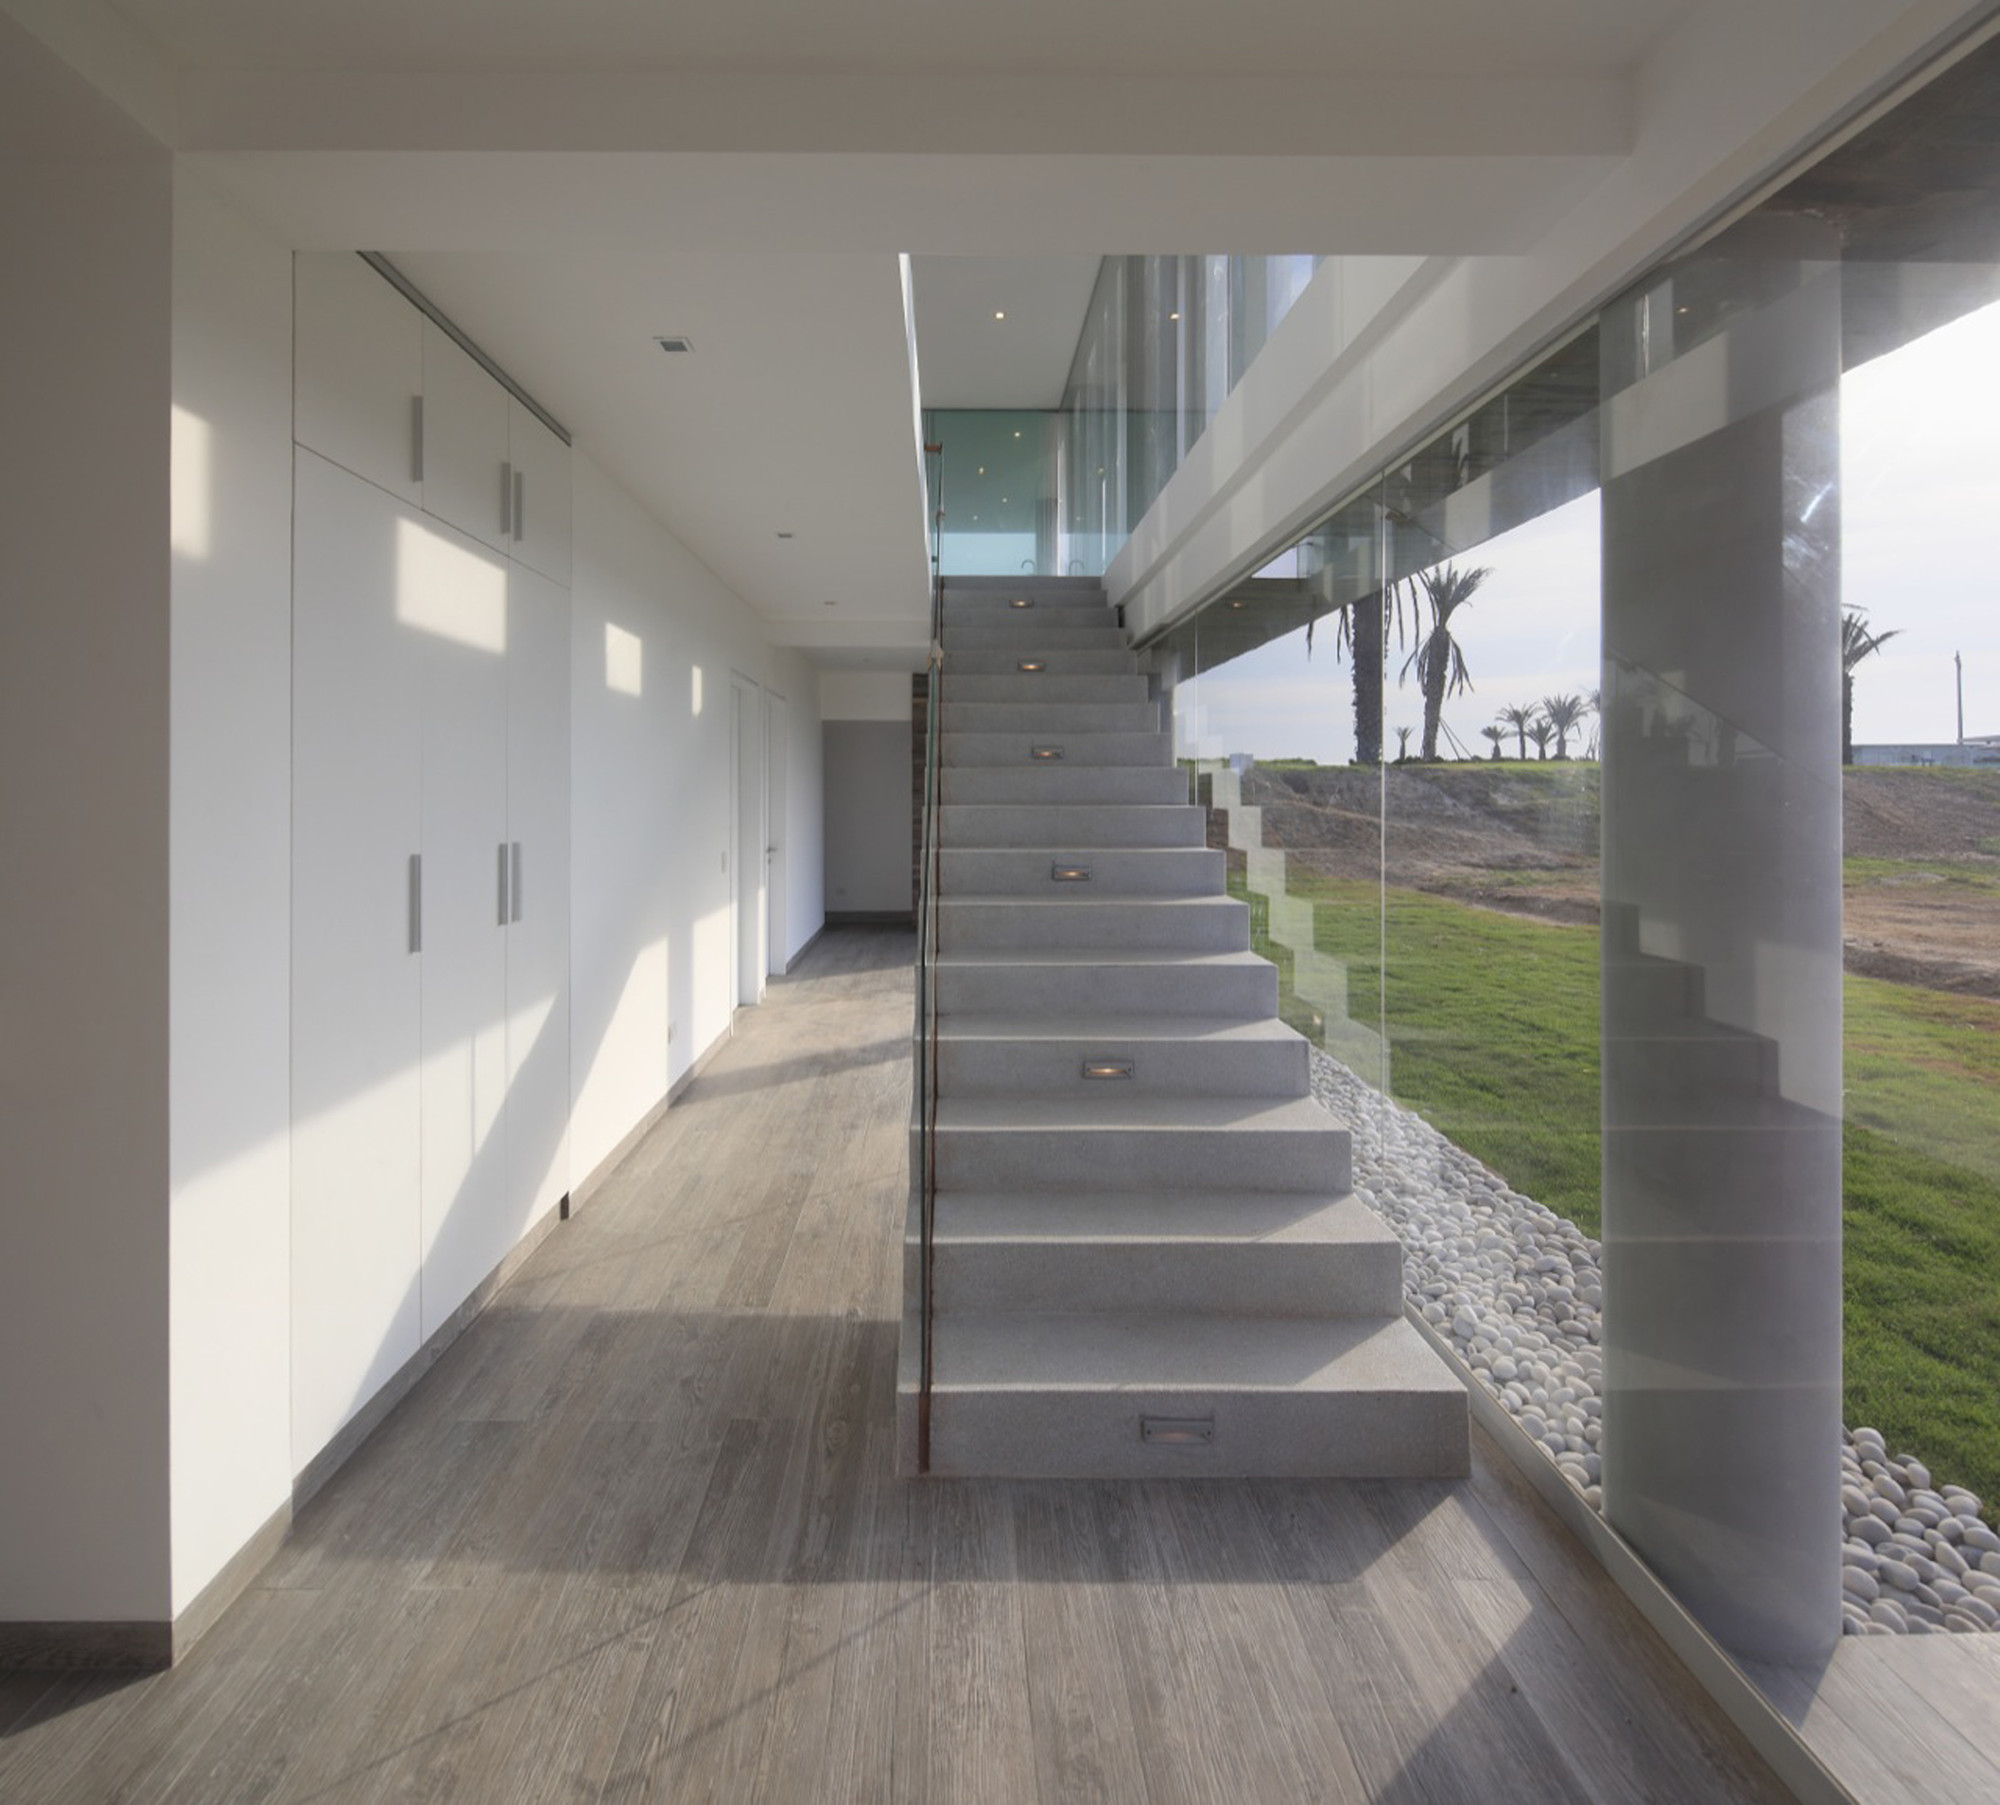 Solano Apartments: House In La Jolla / Metropolis